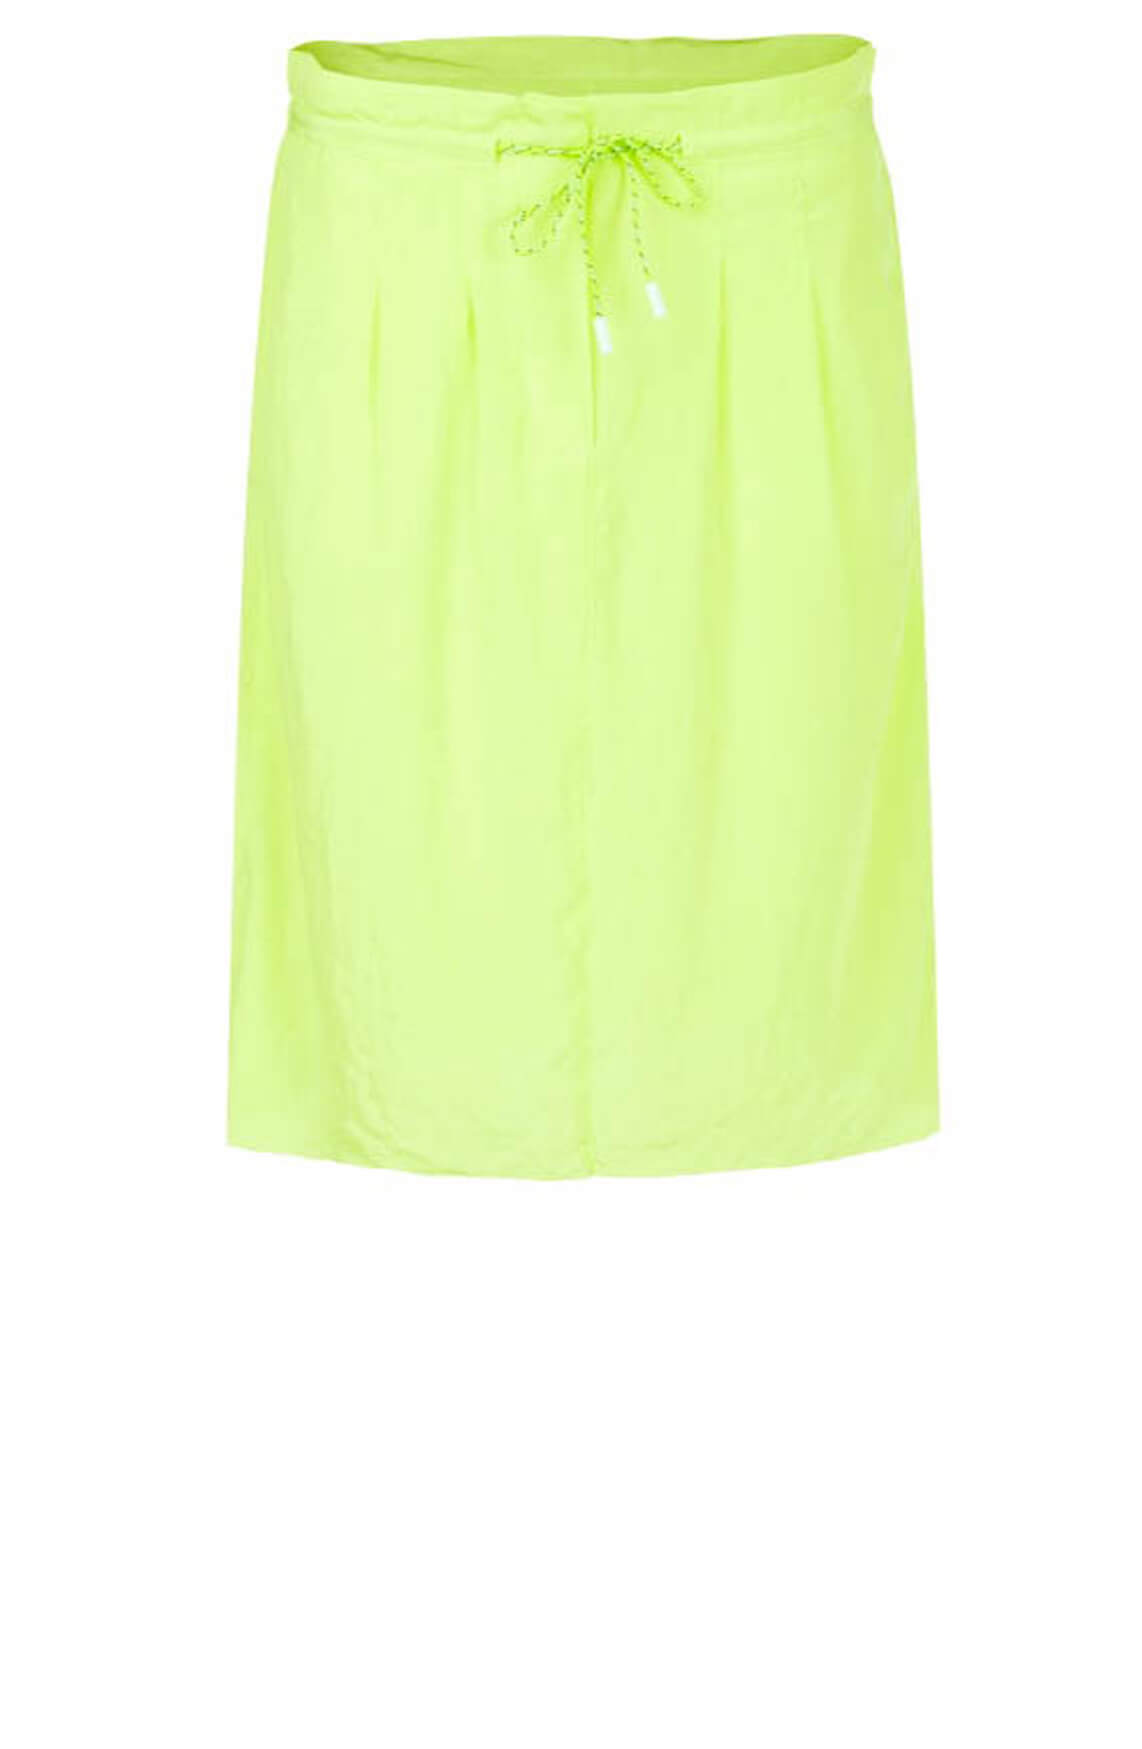 Marccain Sports Dames Neon rok geel